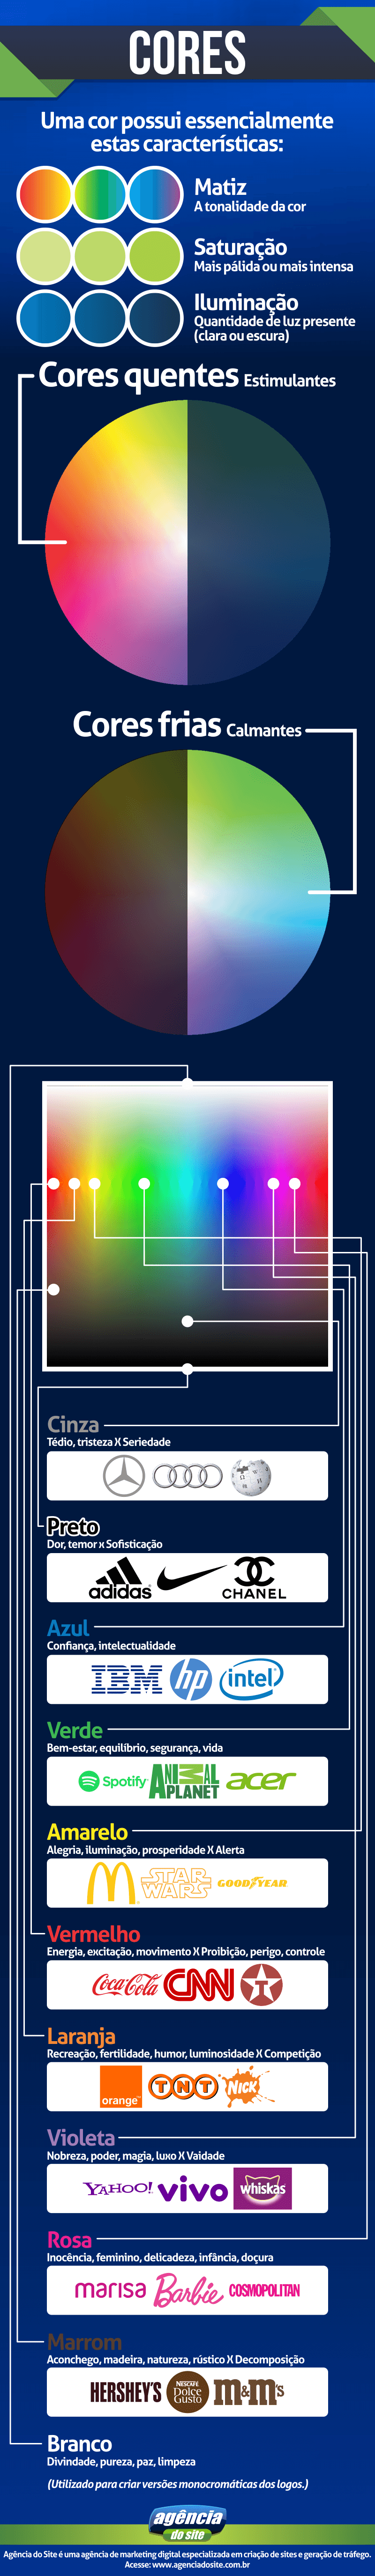 Infografico sobre uso das cores na identidade visual - psicologia e significados